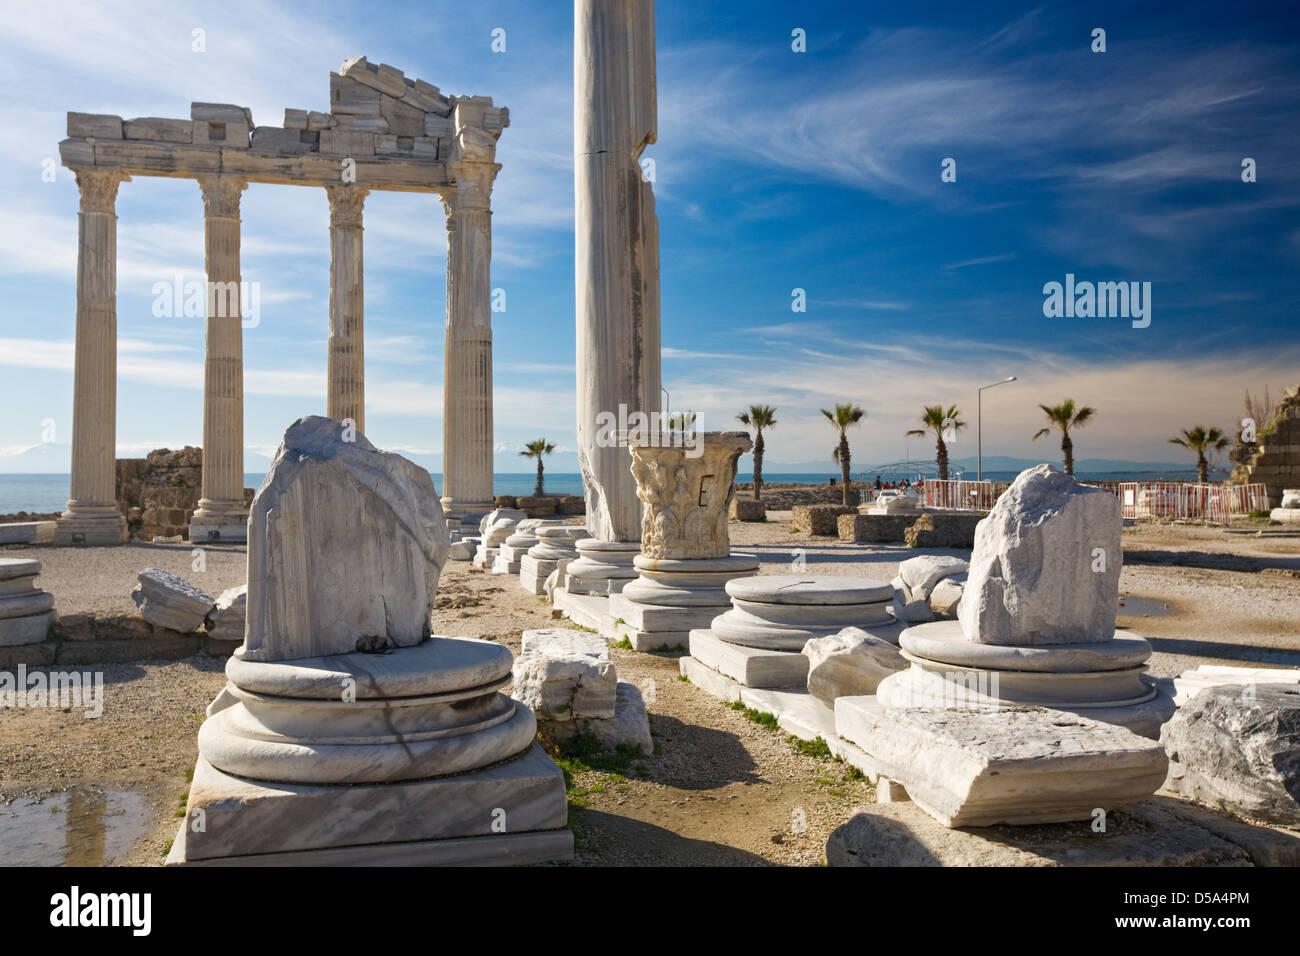 Roman ruins of the Temple of Apollo, Side, Turquoise Coast, Antalya Province, Turkey - Stock Image